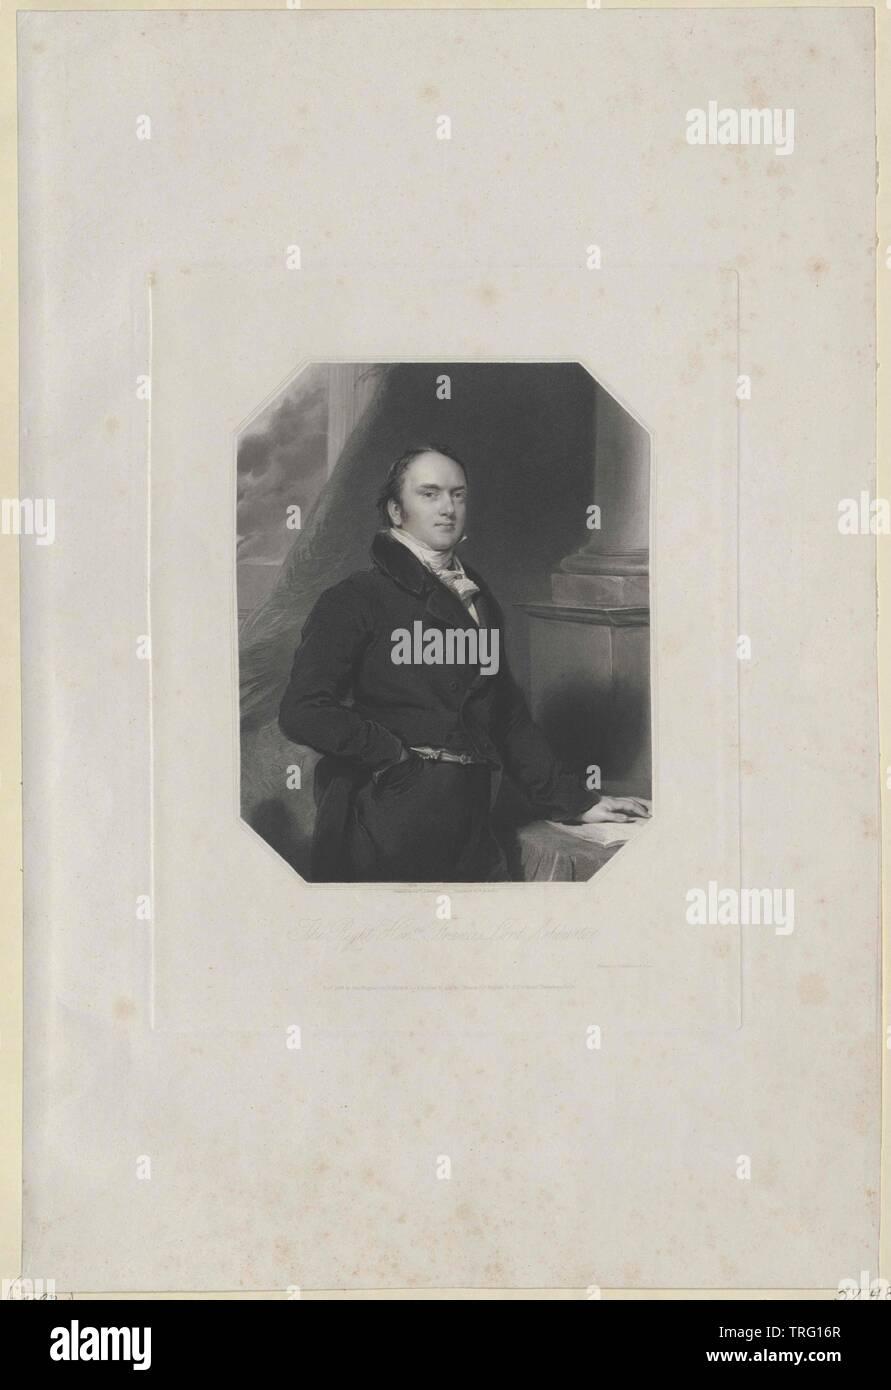 Bingham Baring, 2nd Baron Ashburton